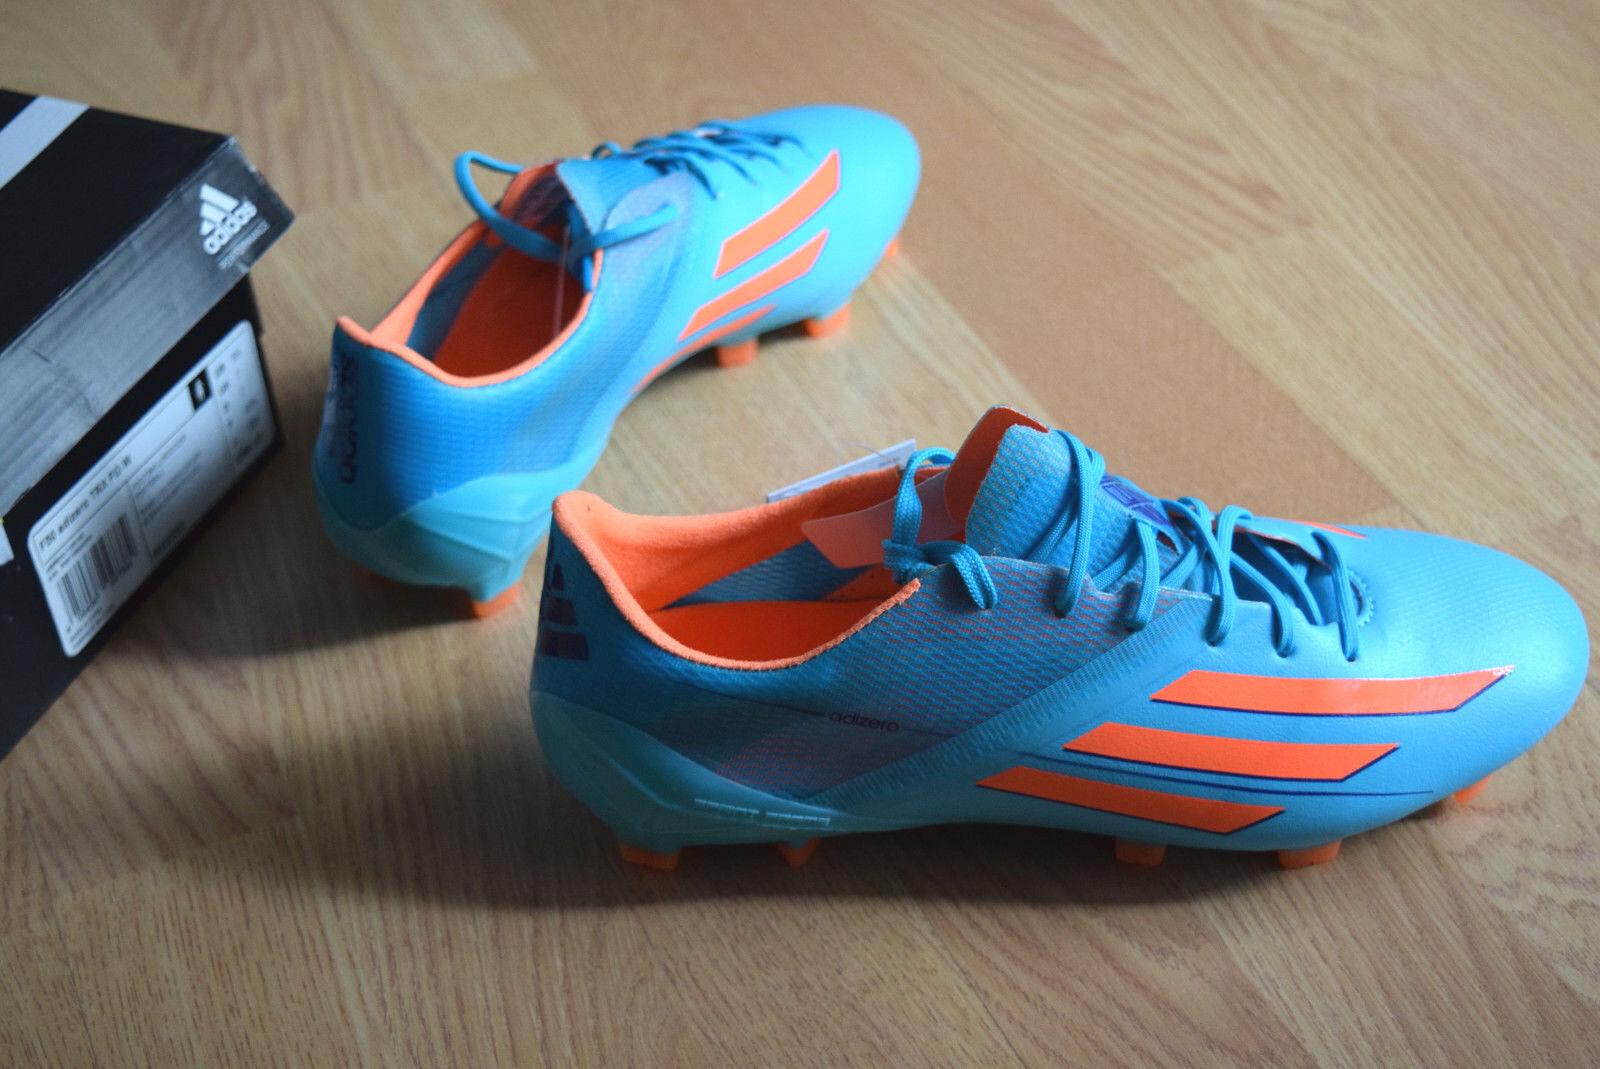 Adidas f50 adizero fg 36 36,5 mujer Premium Zapatos de fútbol m22253 Projoator